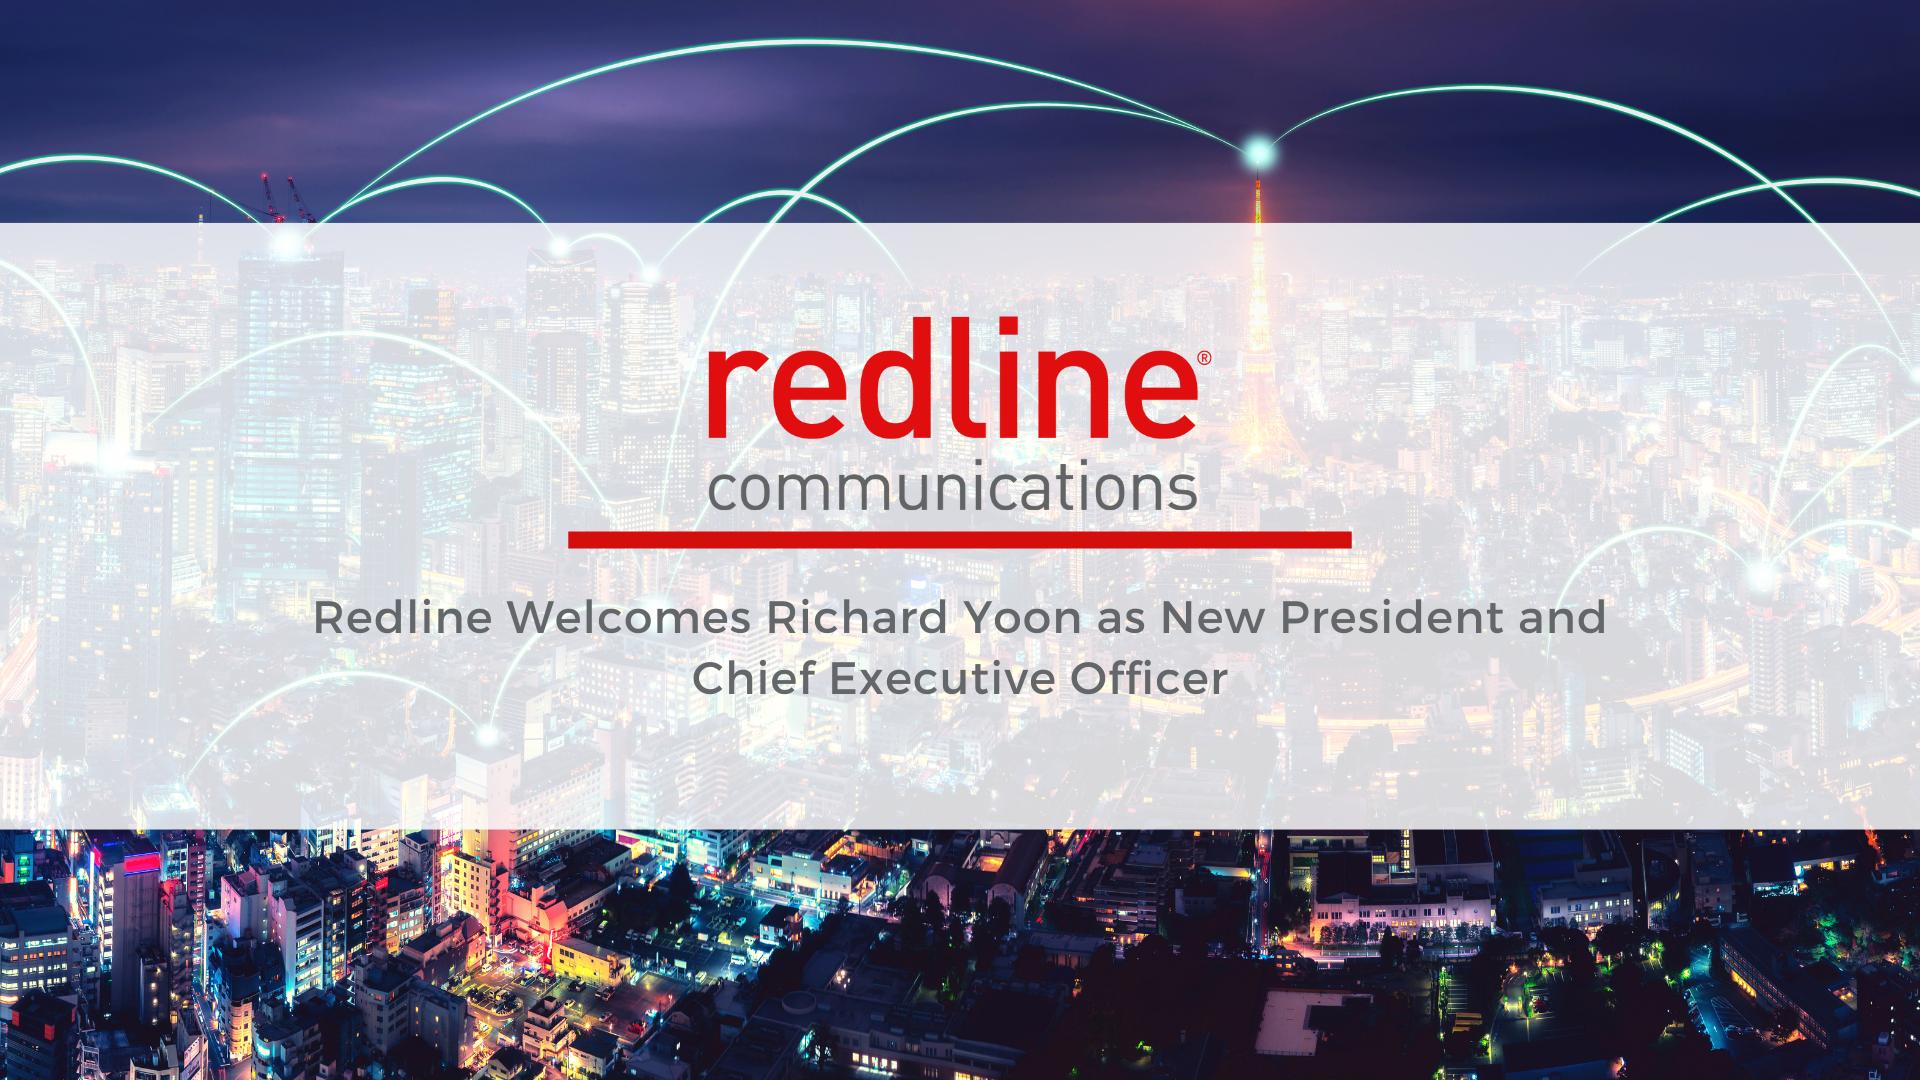 Redline - Richard Yoon